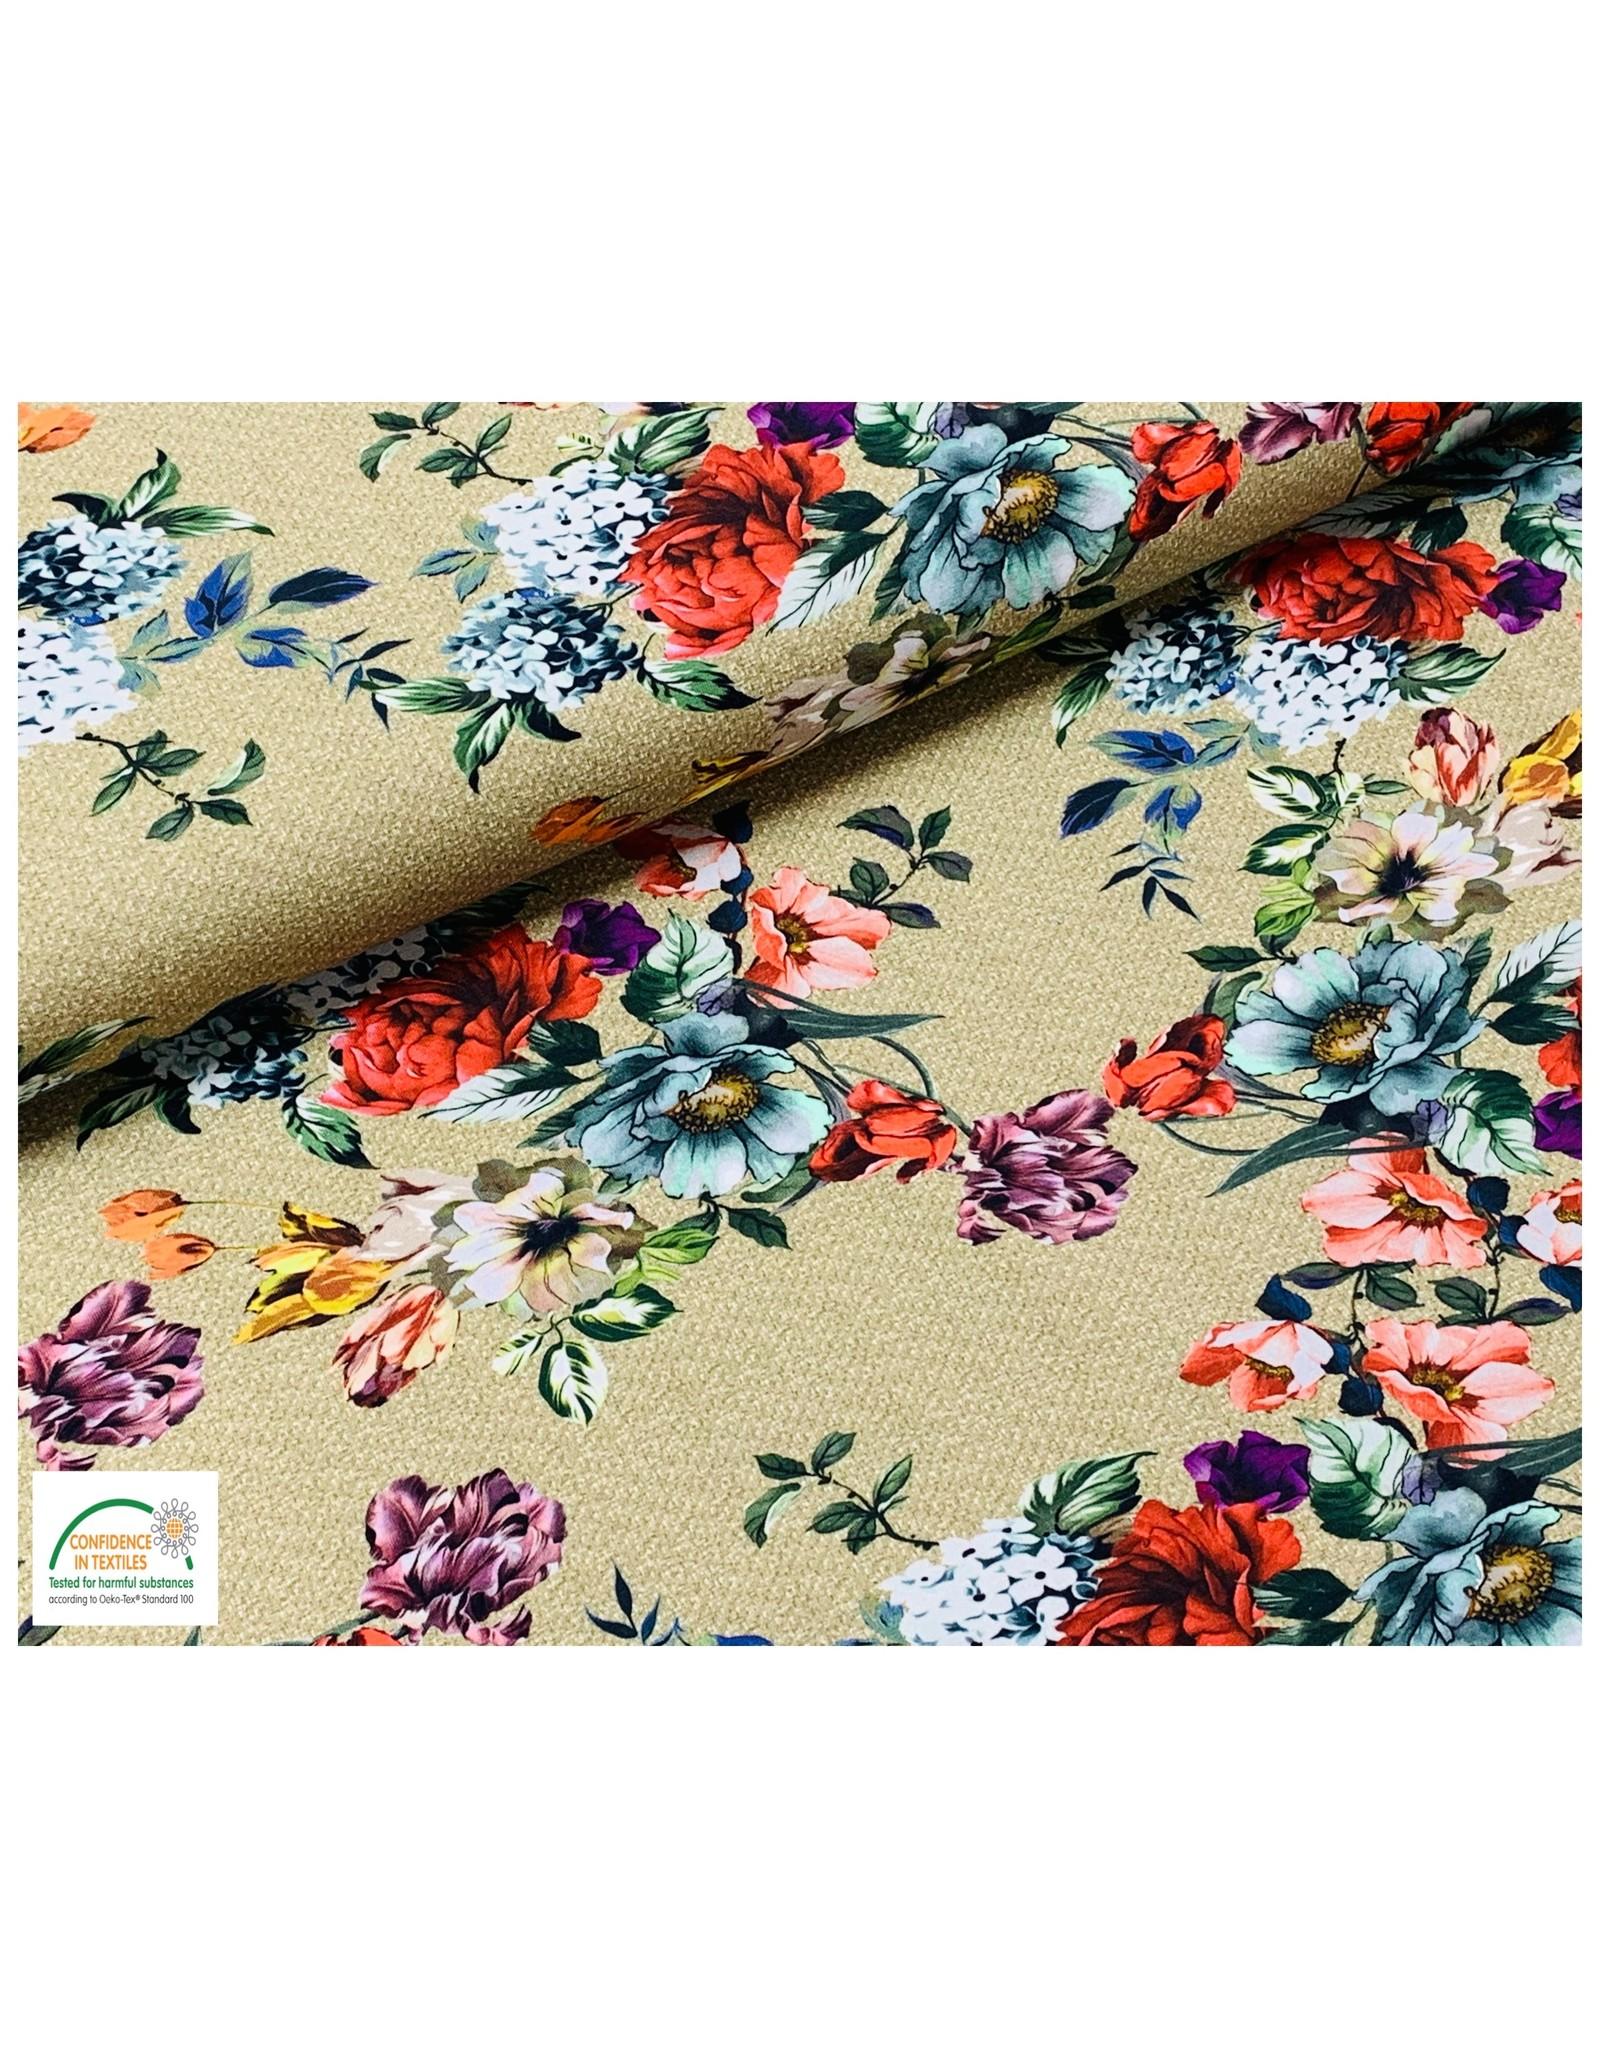 Megan Blue Fabrics Bauwmolljersey Blumen